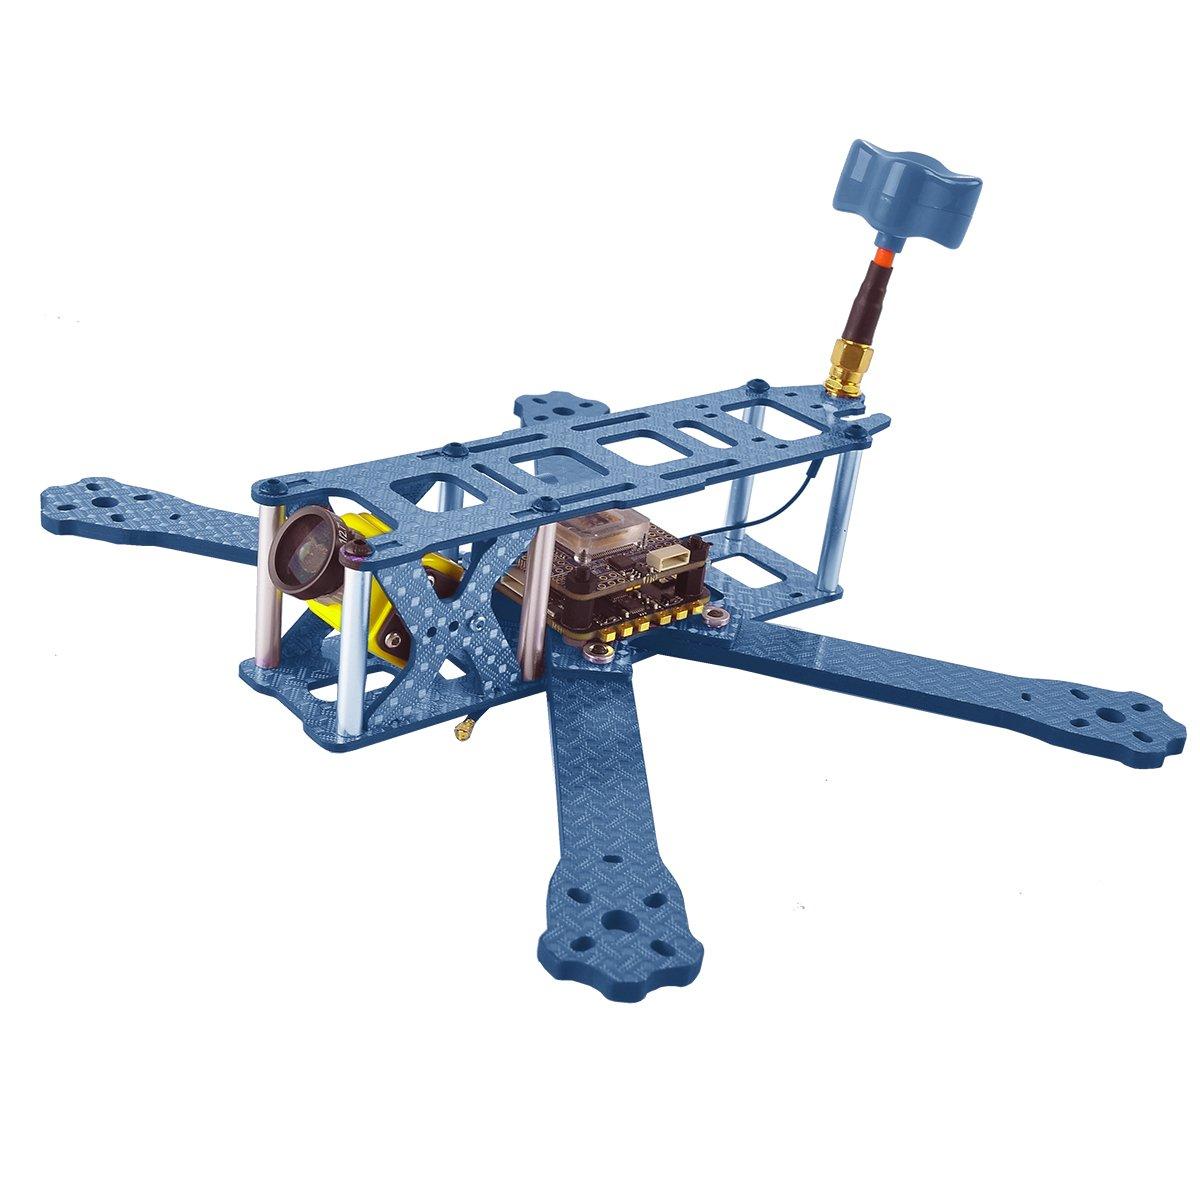 DroneAcc QAV215 Fibra de carbono FPV Racing Drone marco Quadcopter ...